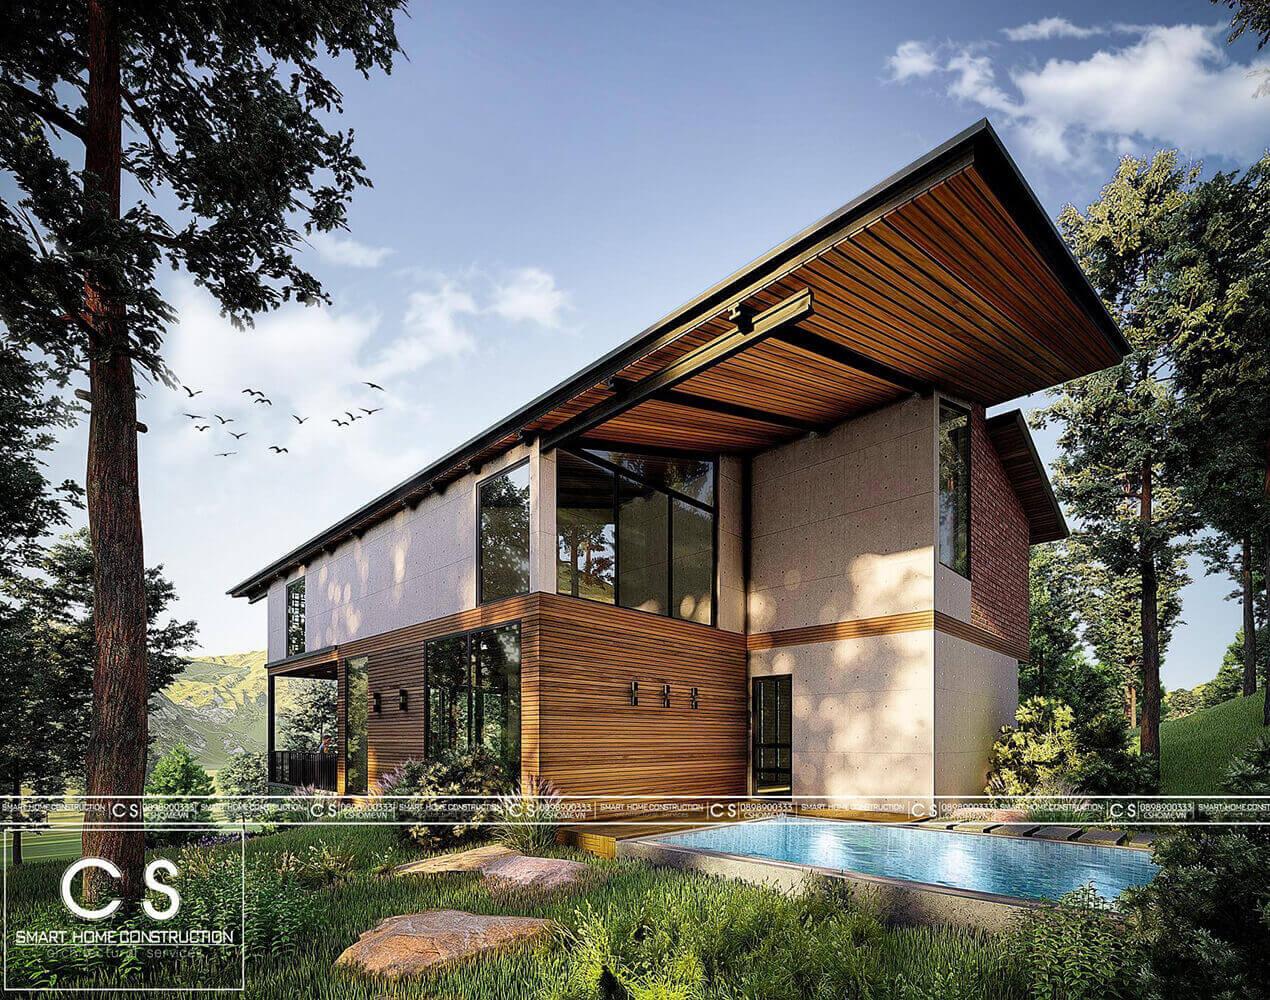 thiết kế kiến trúc homestay vườn đồi